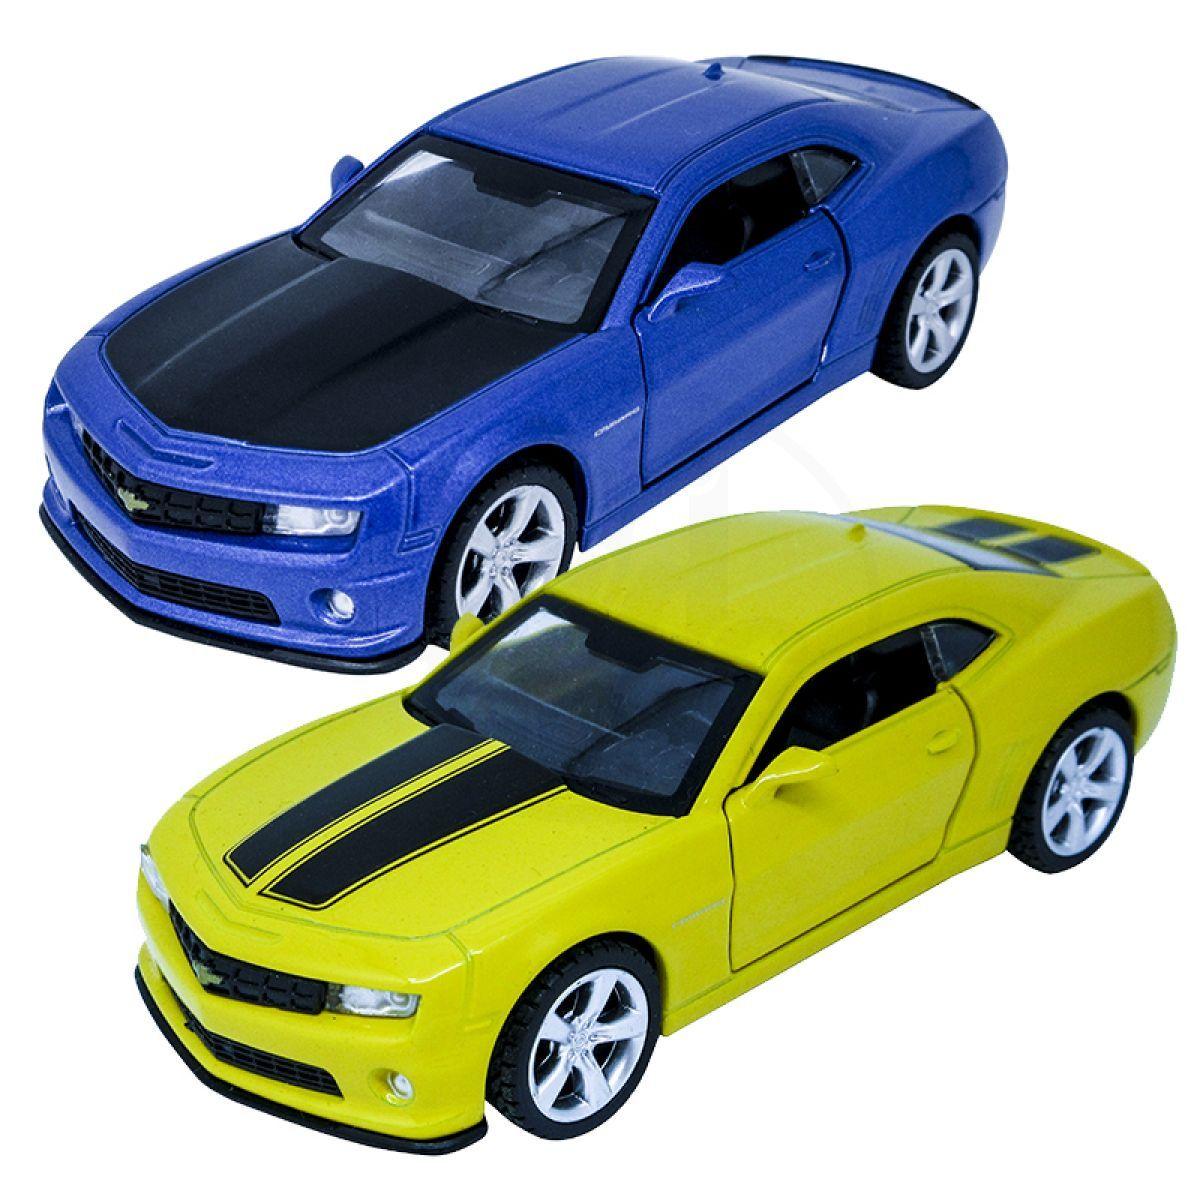 HM Studio kovový model Chevrolet Camaro SS 1:43 - Modré